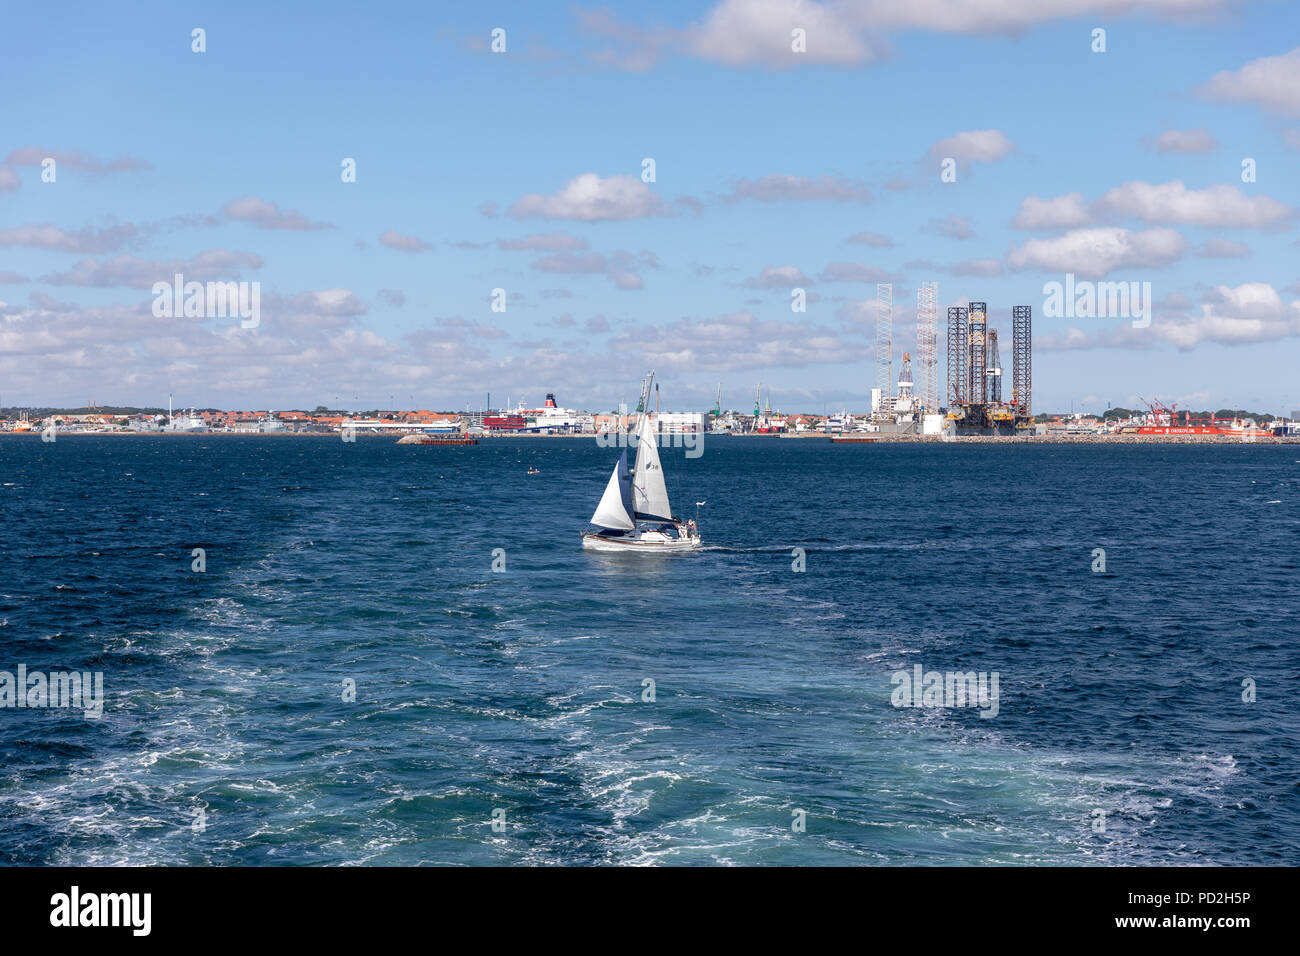 Sailing boat in Kattegat outside Frederikshavn in the north of Denmark - Stock Image